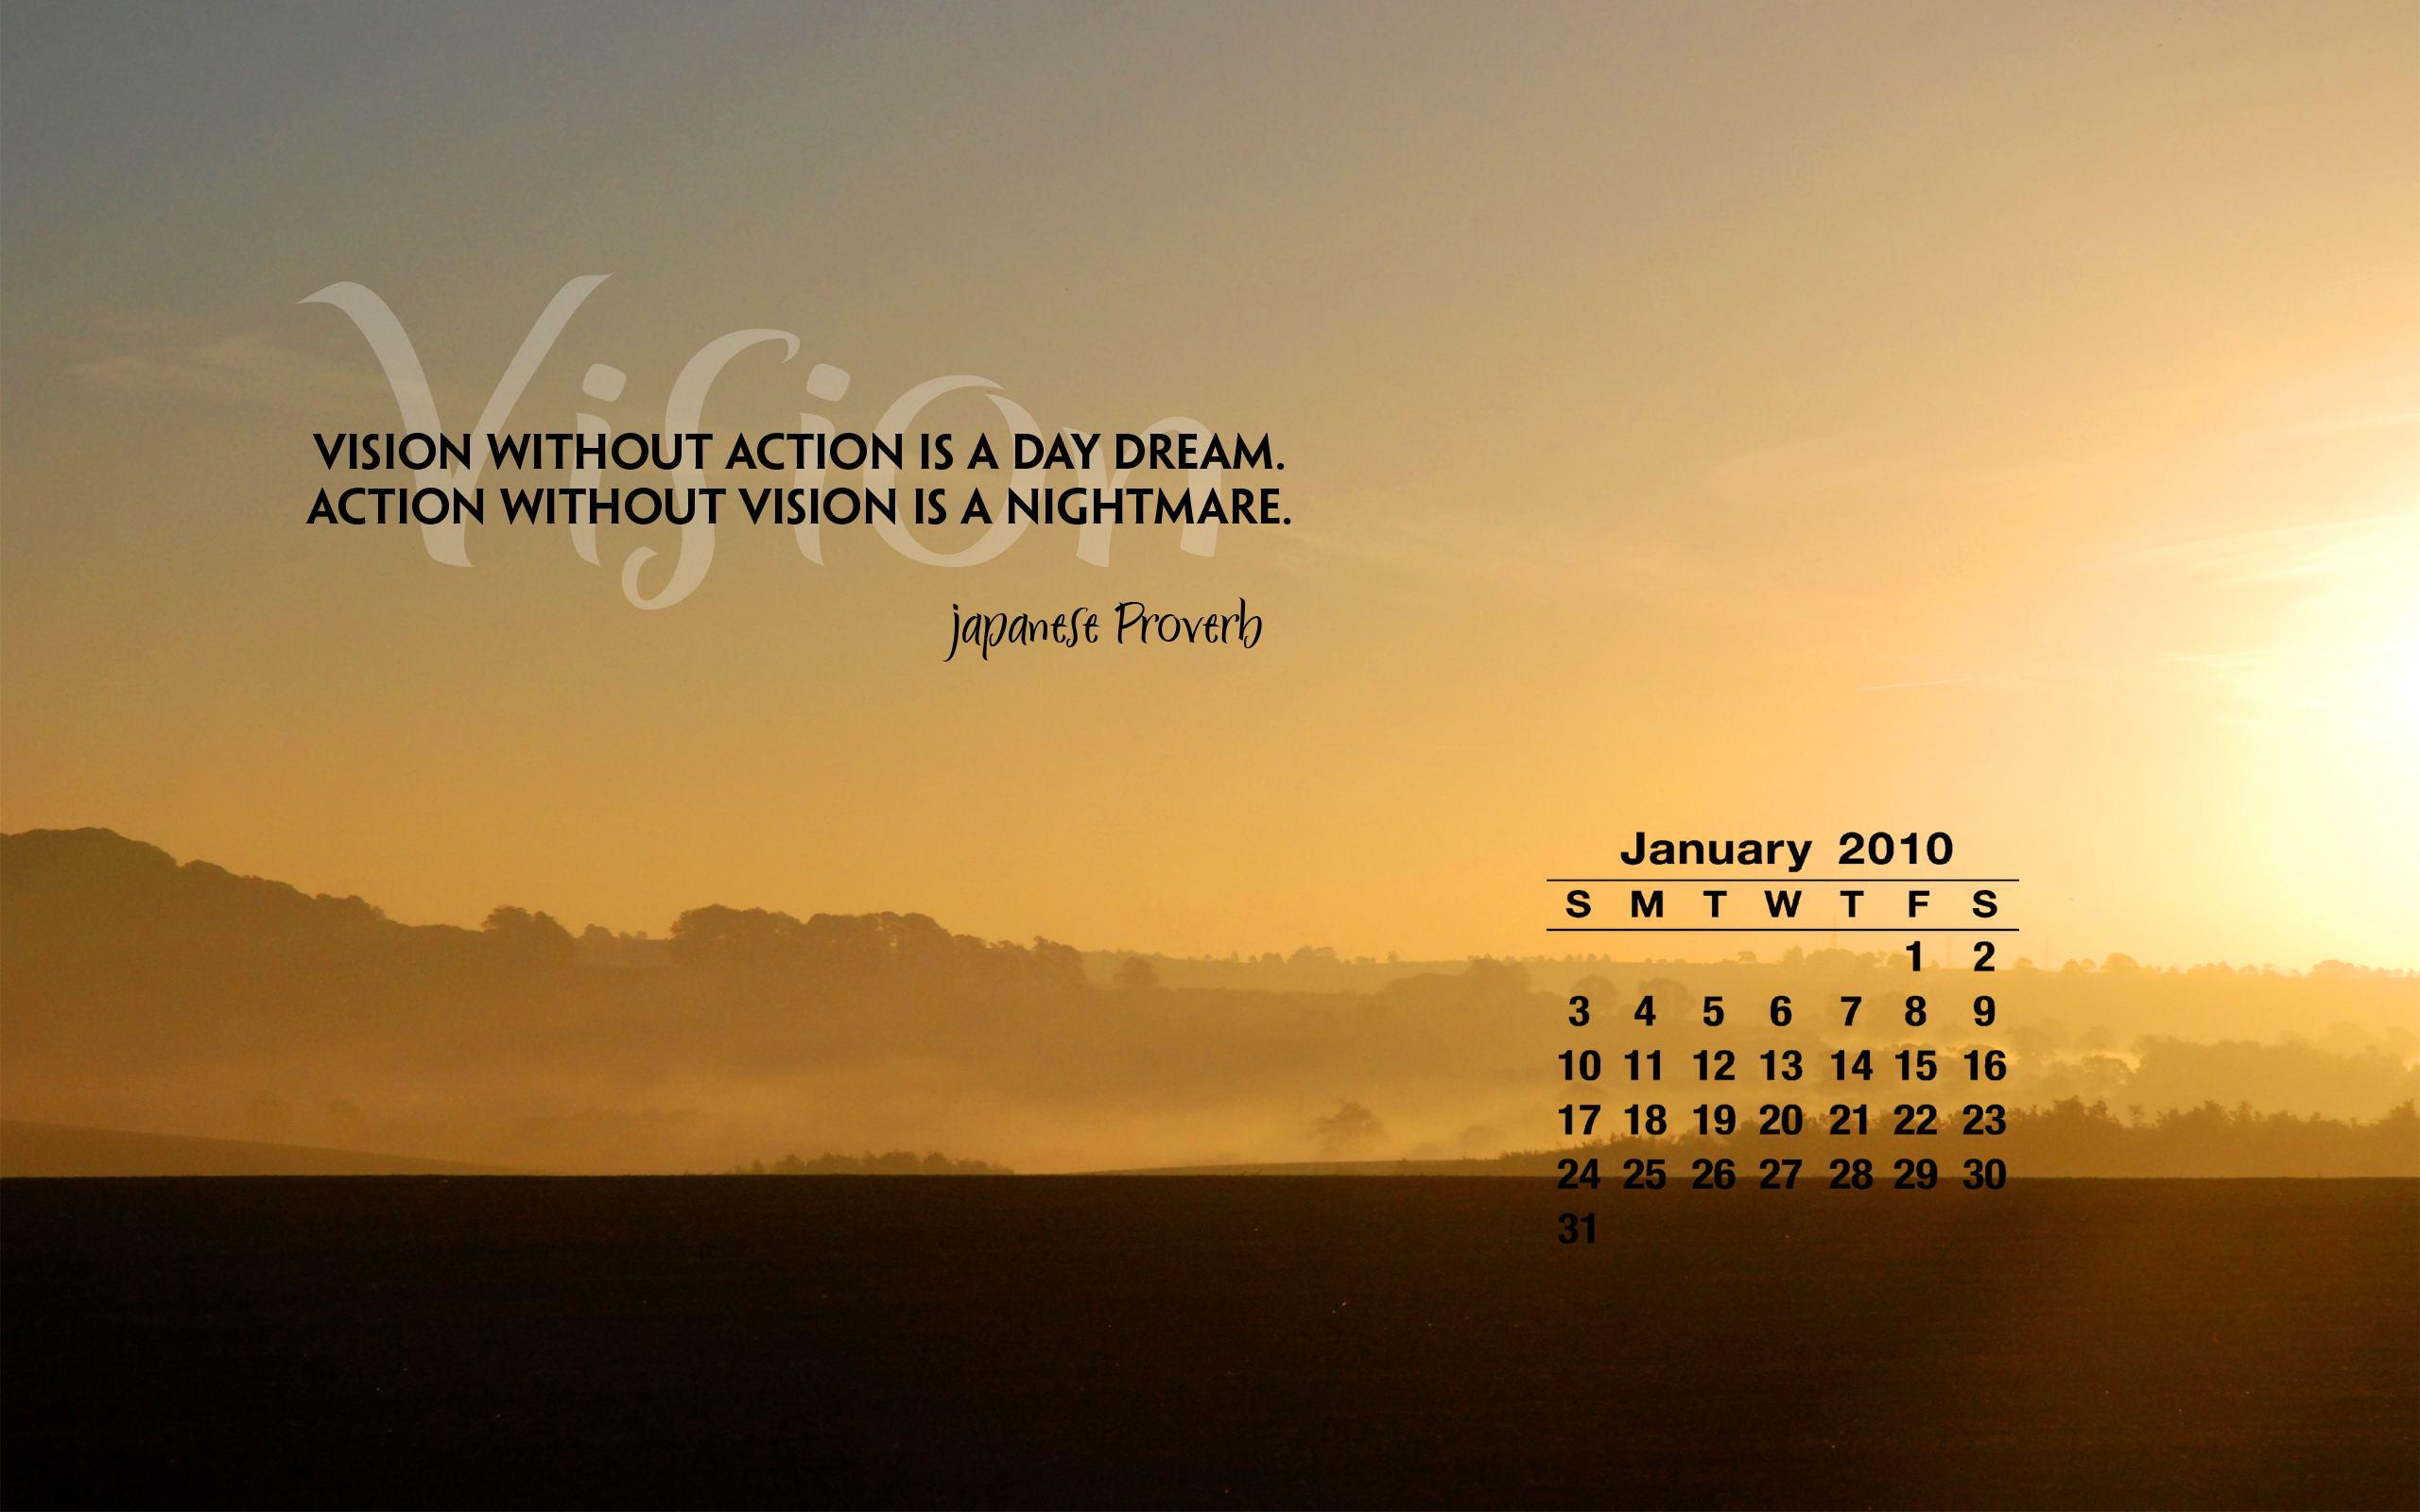 Calendar Wallpaper Quotes : Self help quotes positive quotesgram